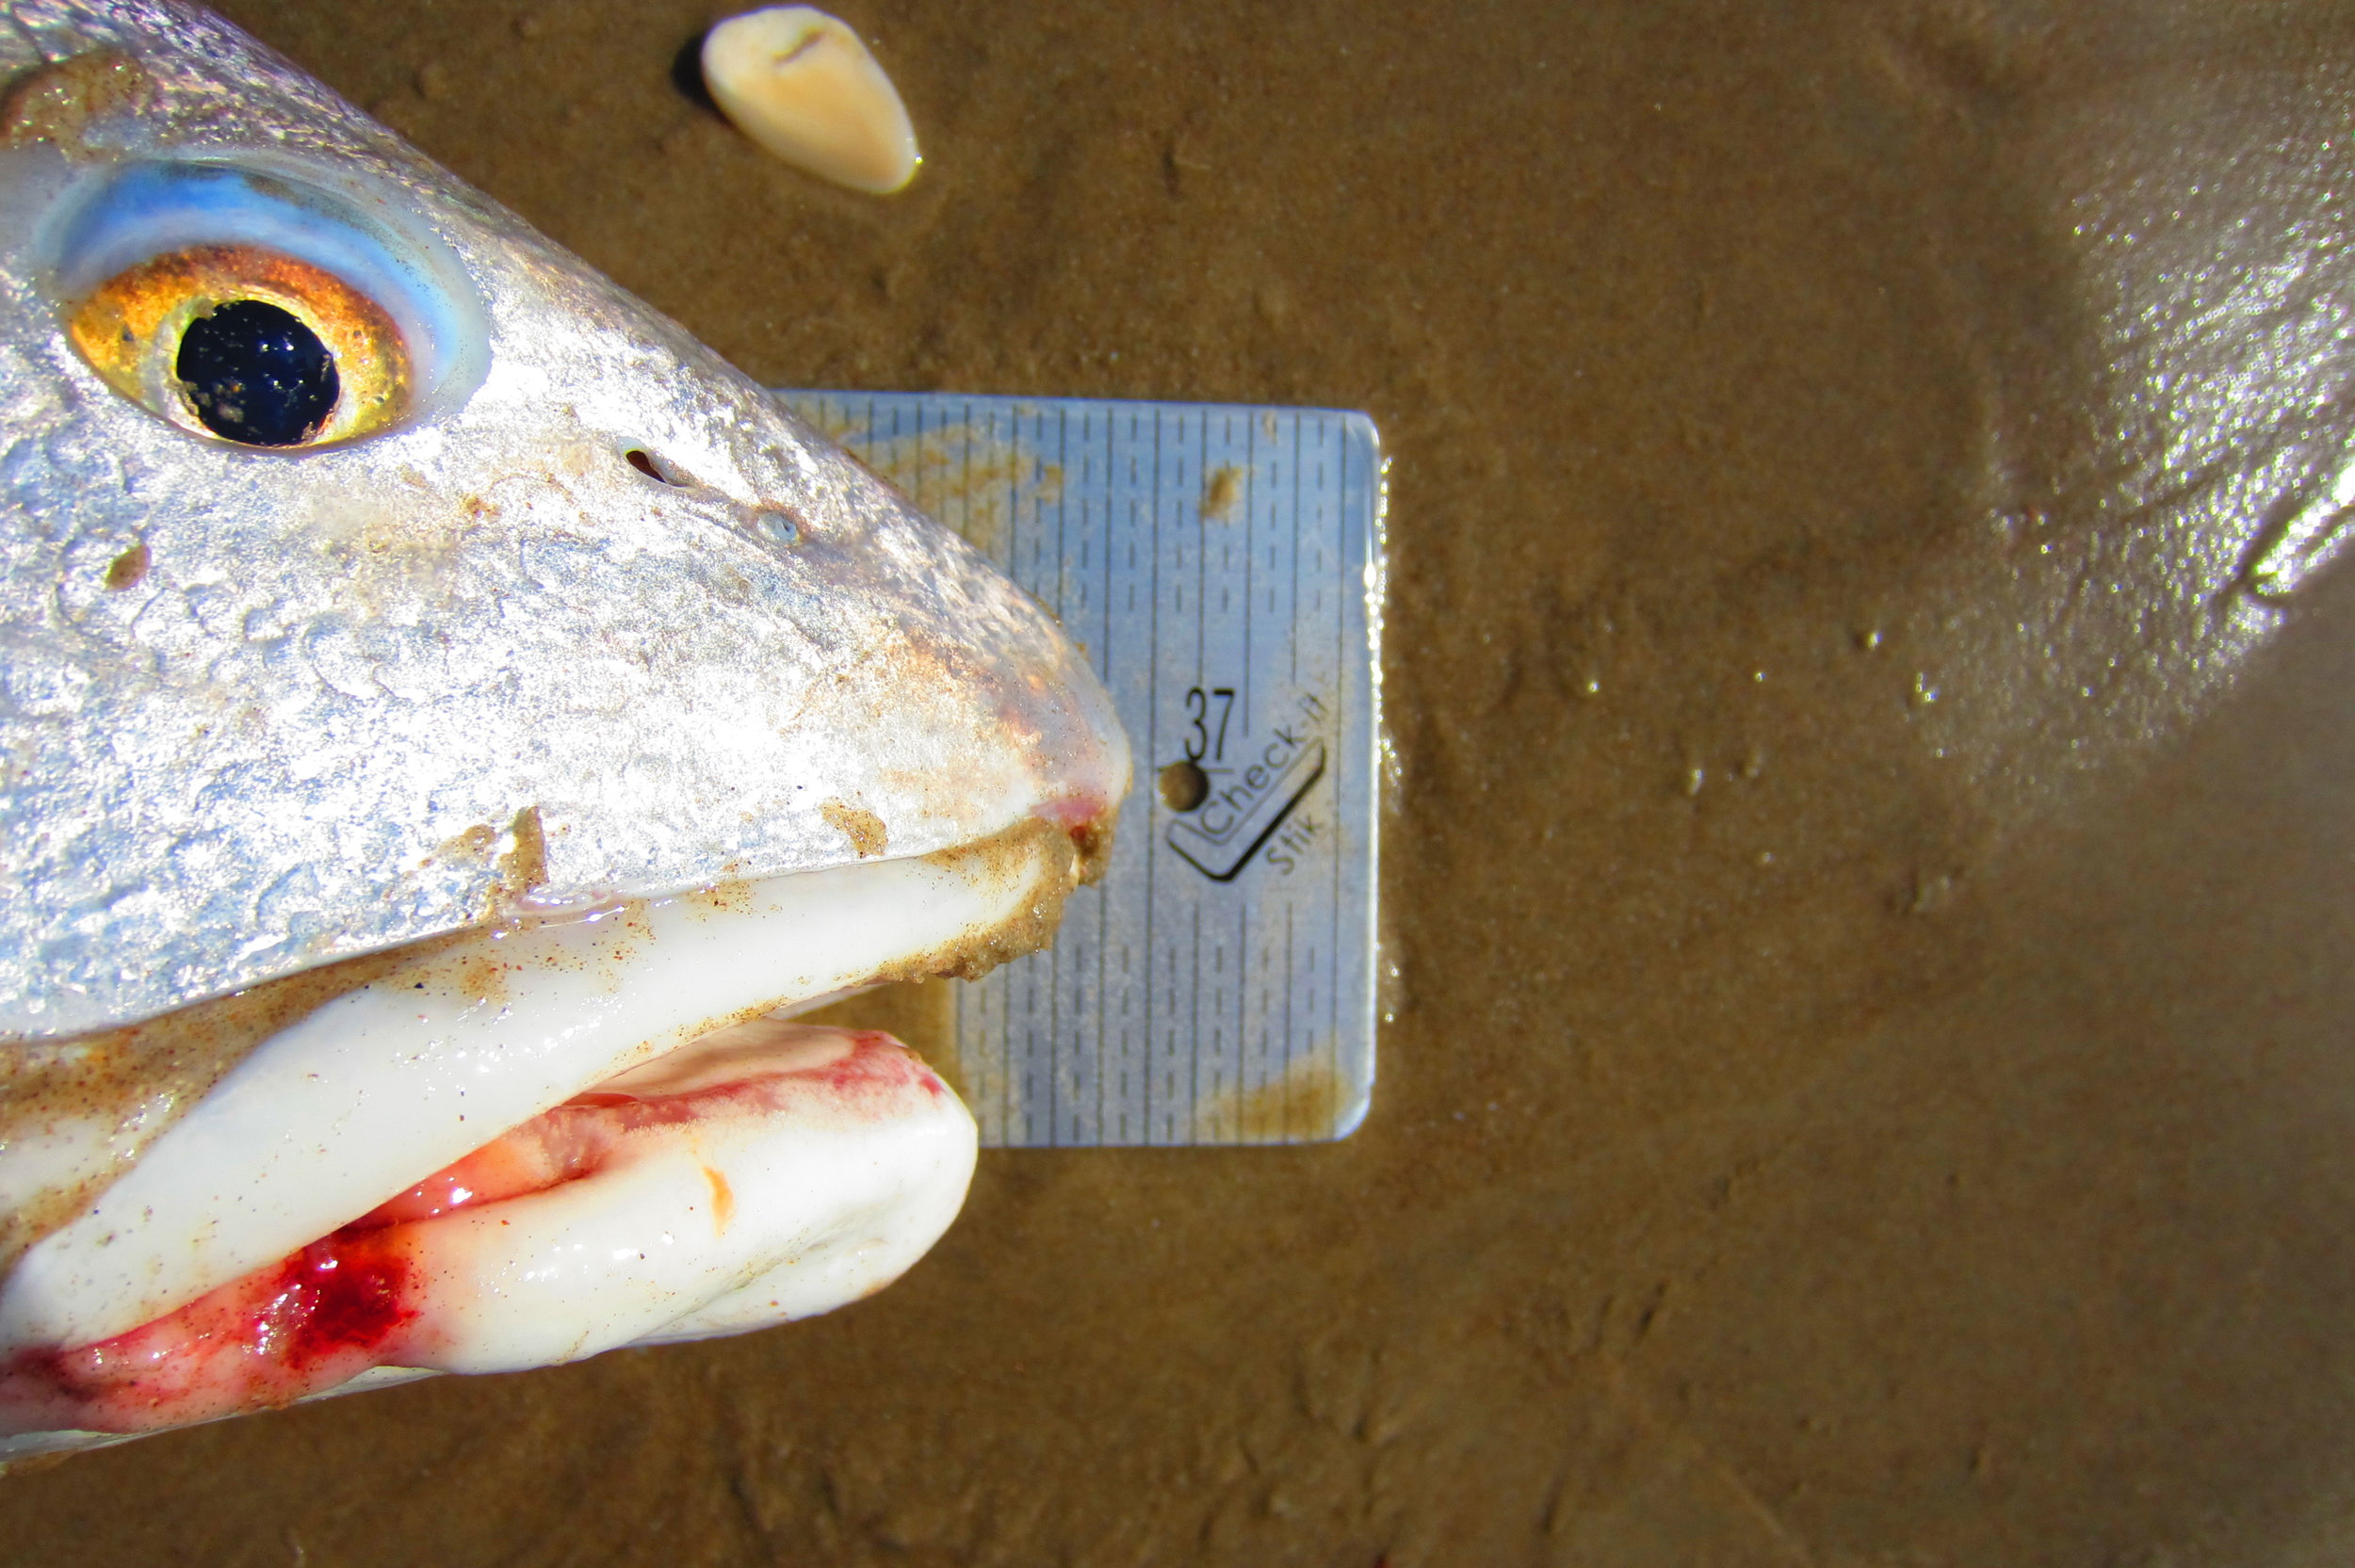 37 Inch Redfish